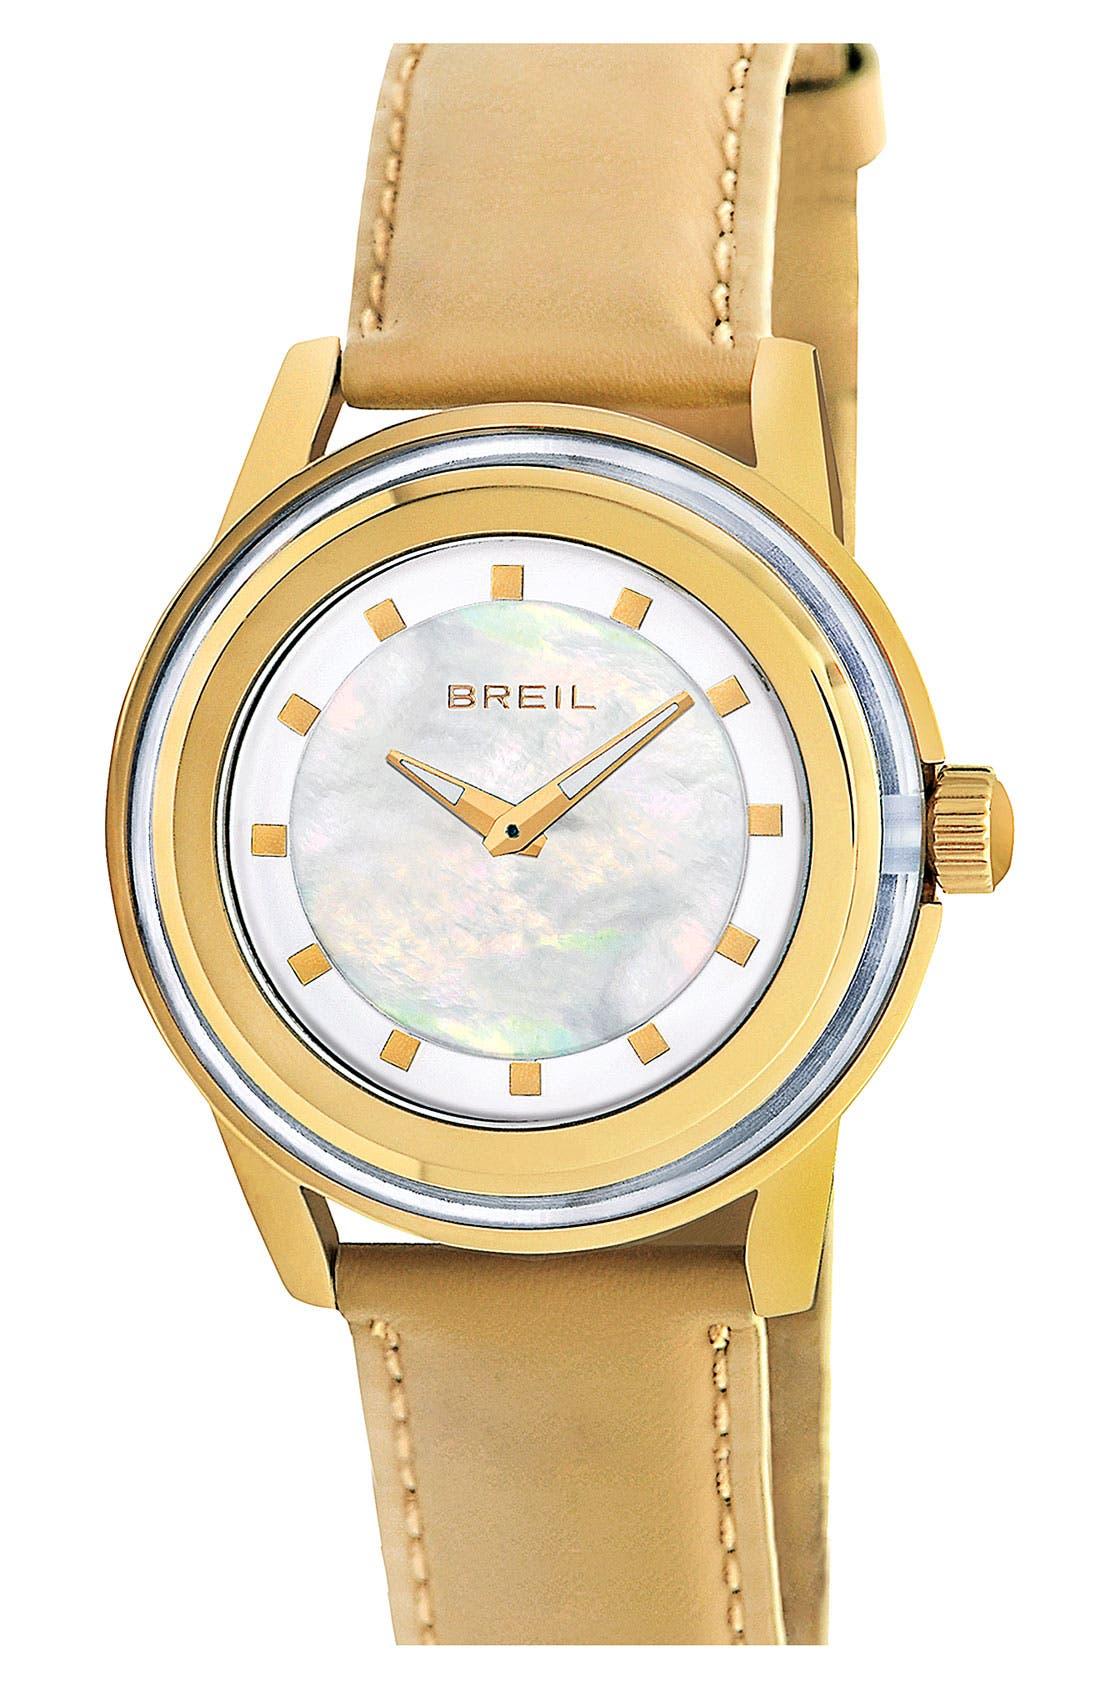 Main Image - Breil 'Orchestra' Round Leather Strap Watch